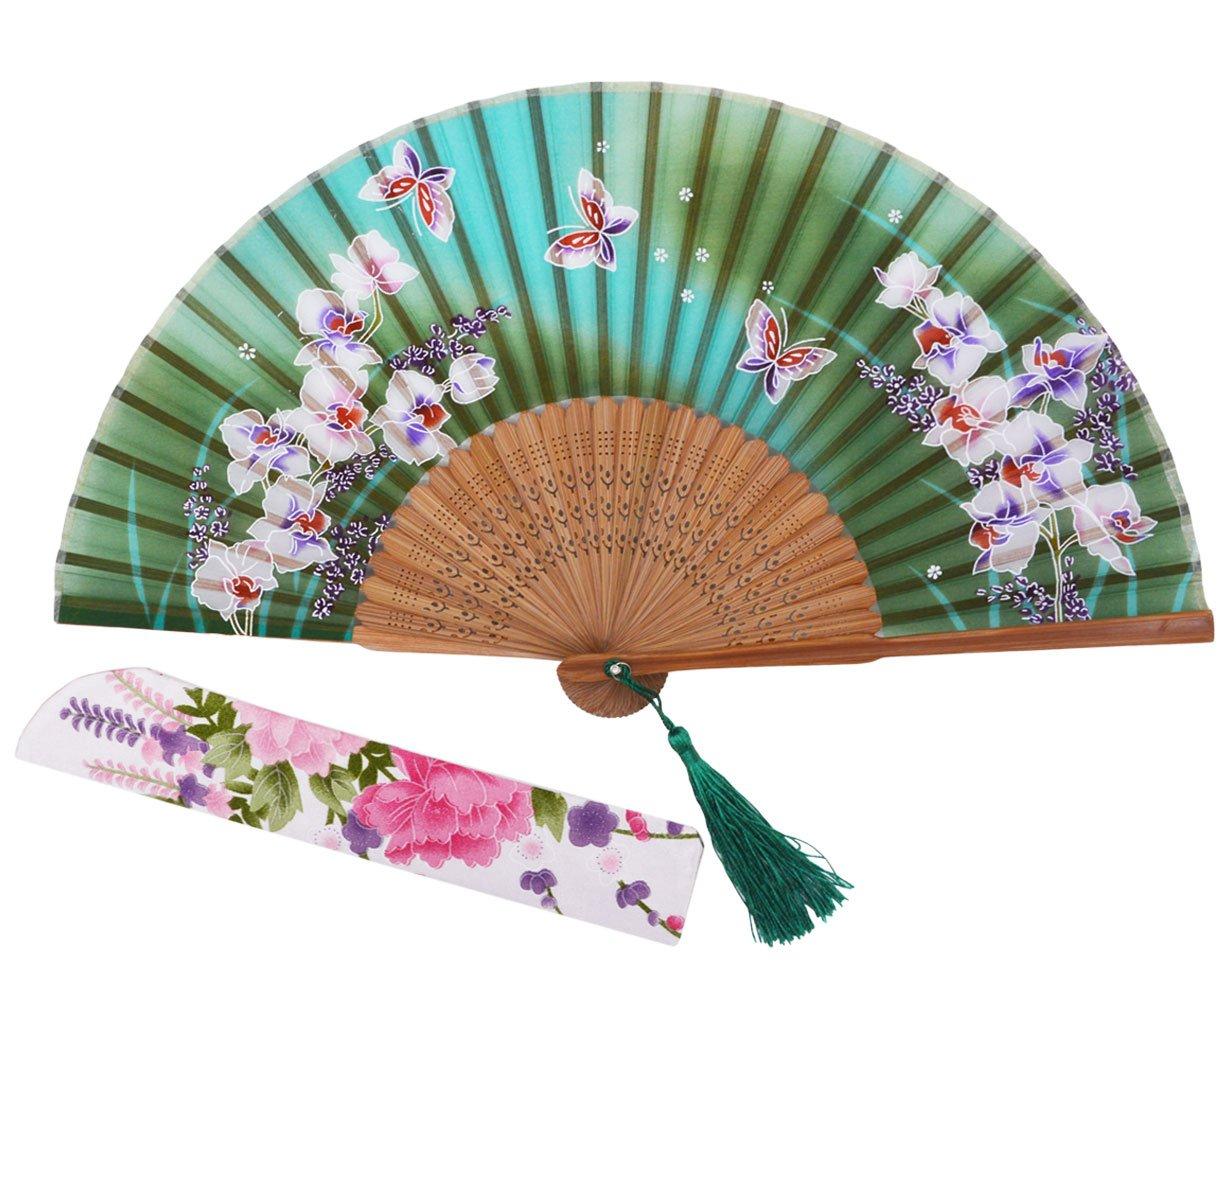 d19bf5612b Sthuahe - Abanico plegable de la gama orqu/í deas para mujer, abanico  chino//japon/é s vintage ...